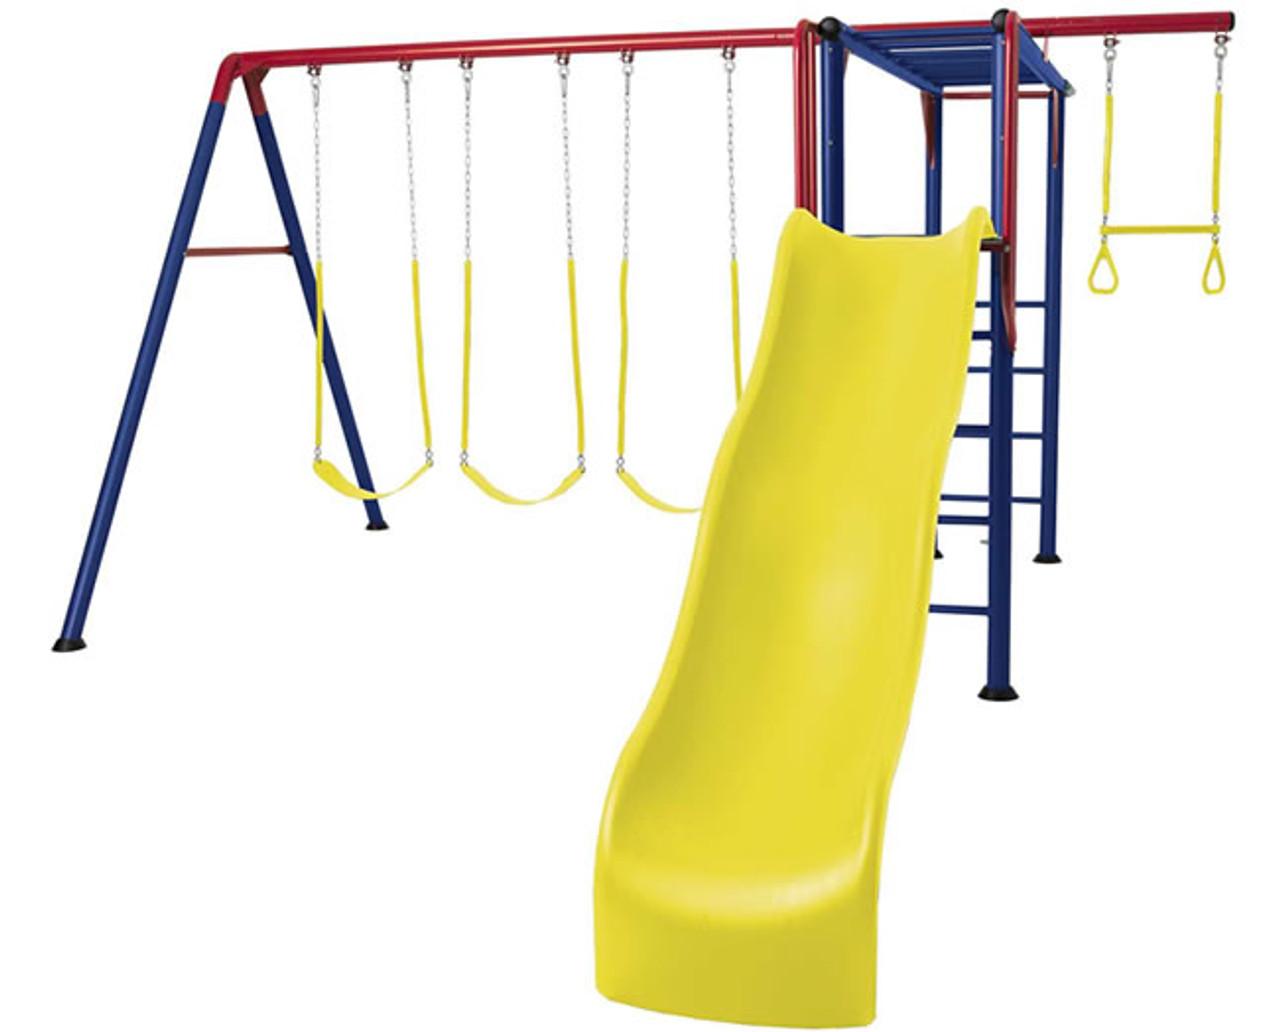 Swing Set Installation